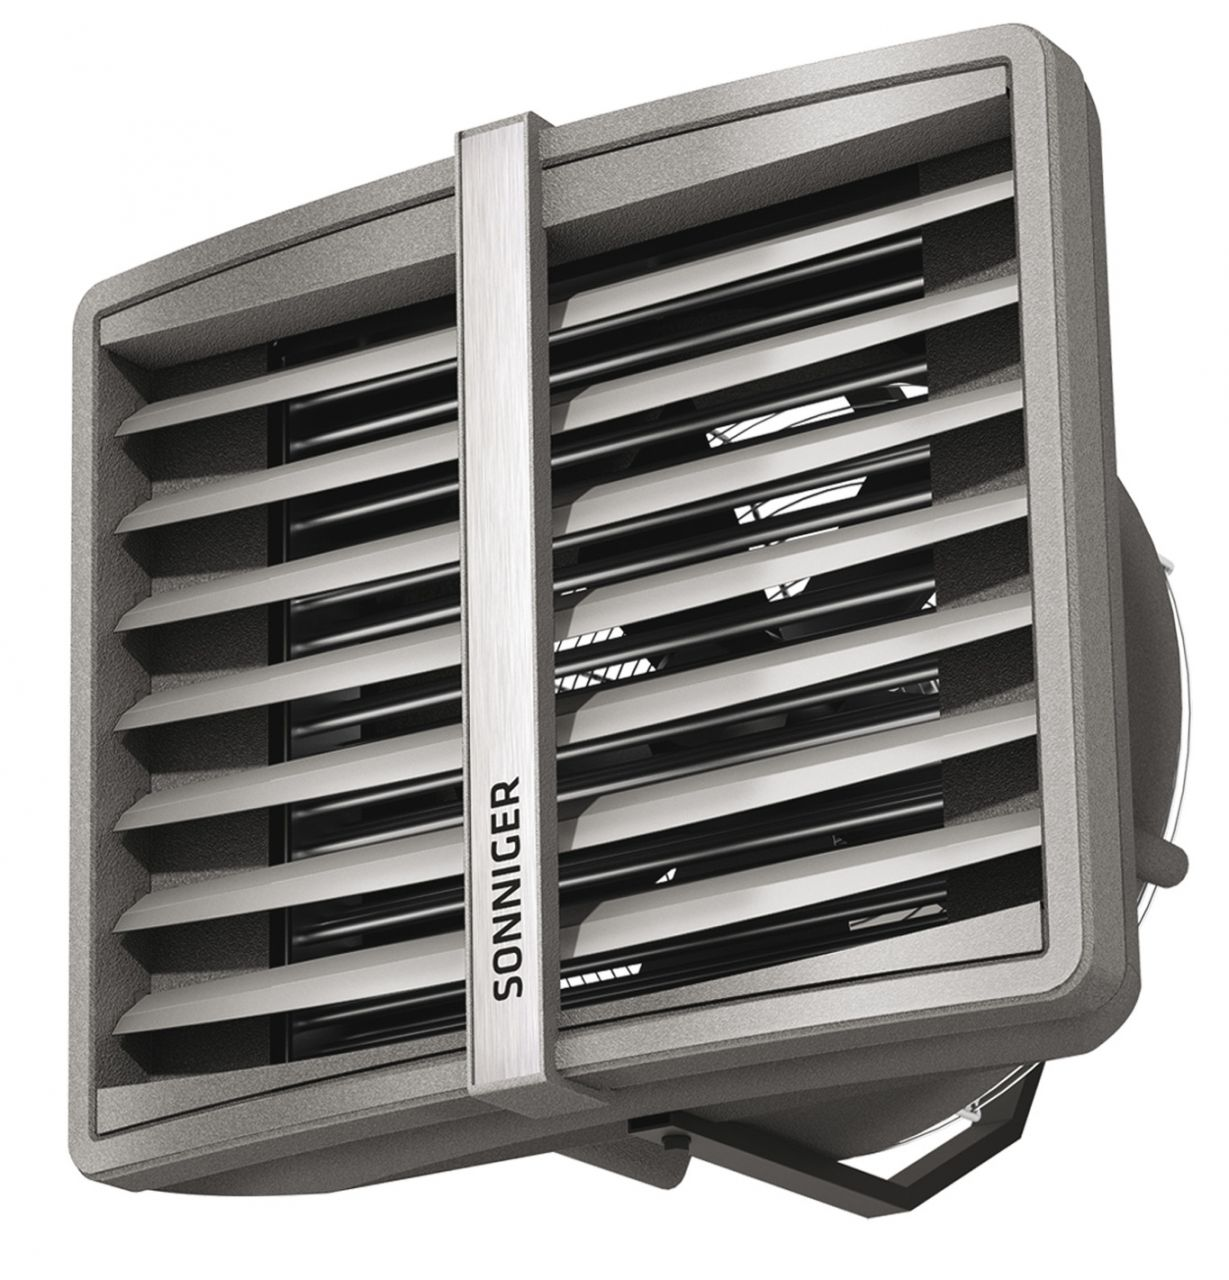 HEATER R2 termoventilátor AC motorral,tartókonzollal Vmax=4600m3/h 30-50 kW